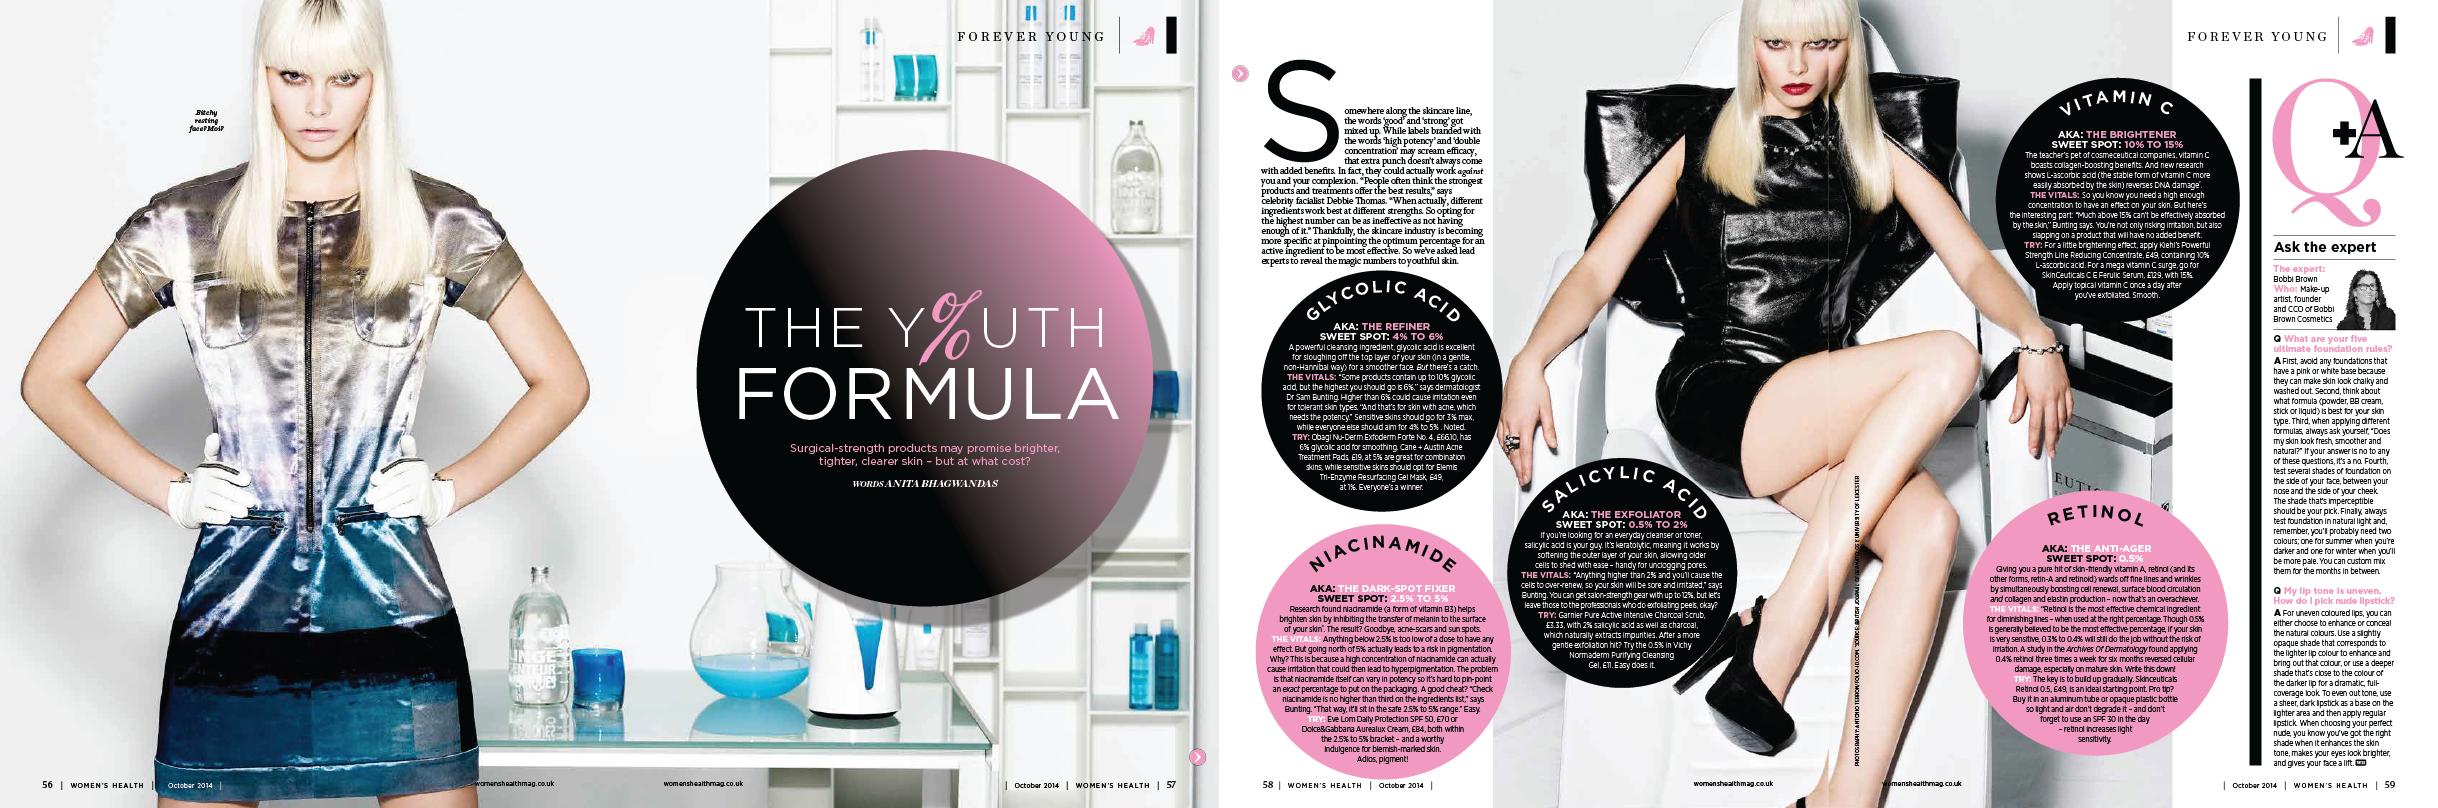 WOMEN'S HEALTH - THE YOUTH FORMULA